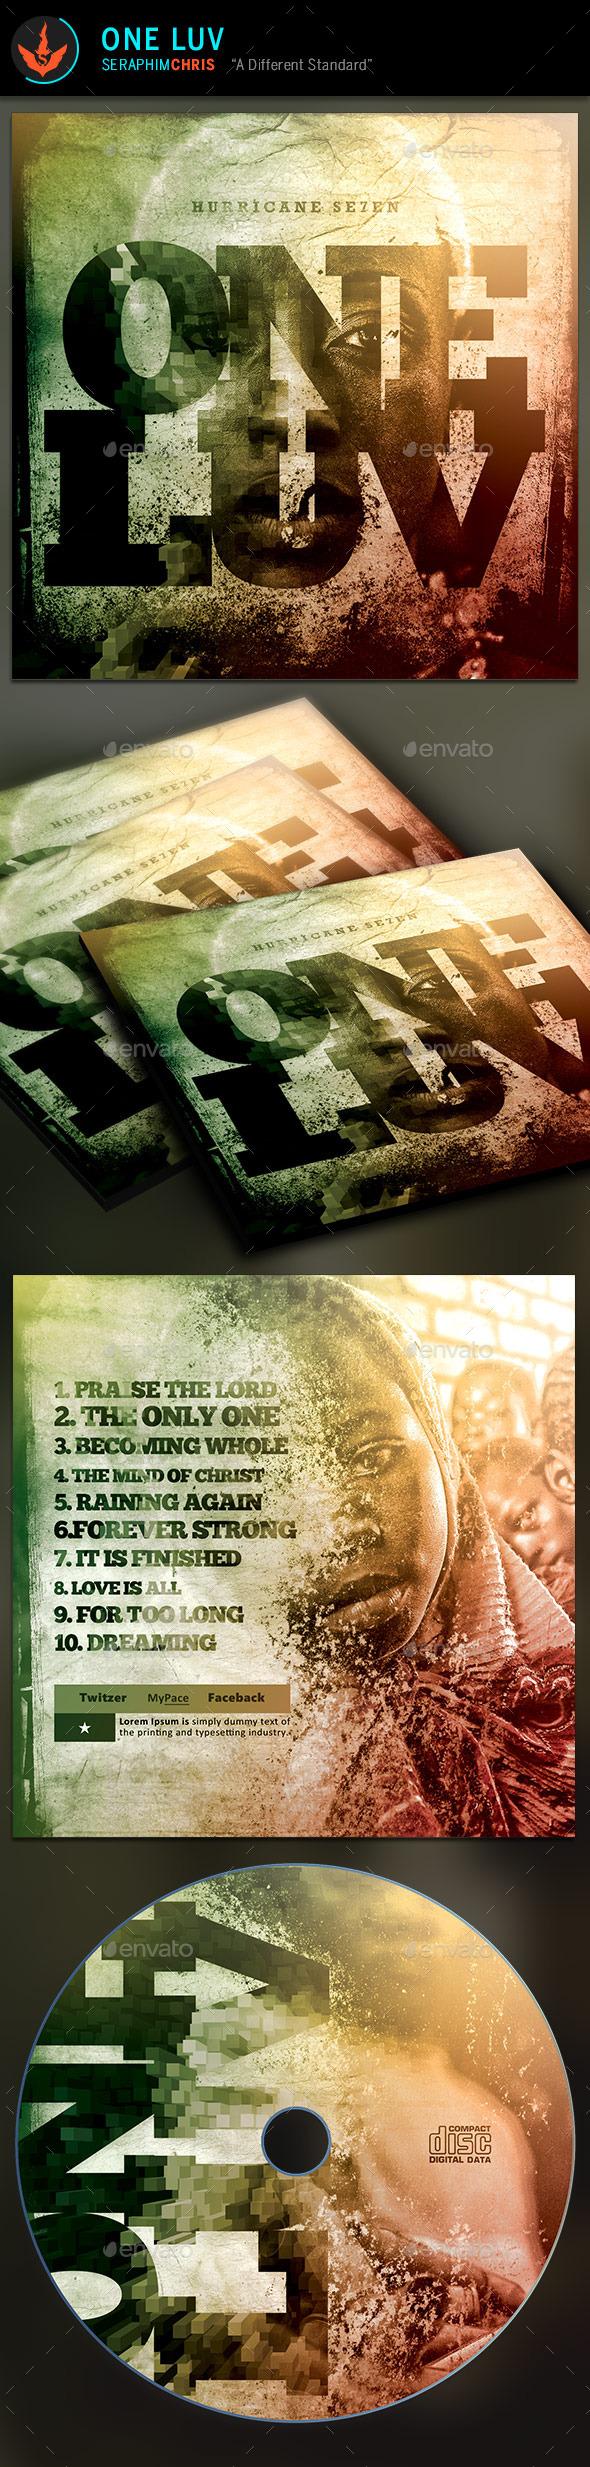 One Love: CD Artwork Template - CD & DVD Artwork Print Templates